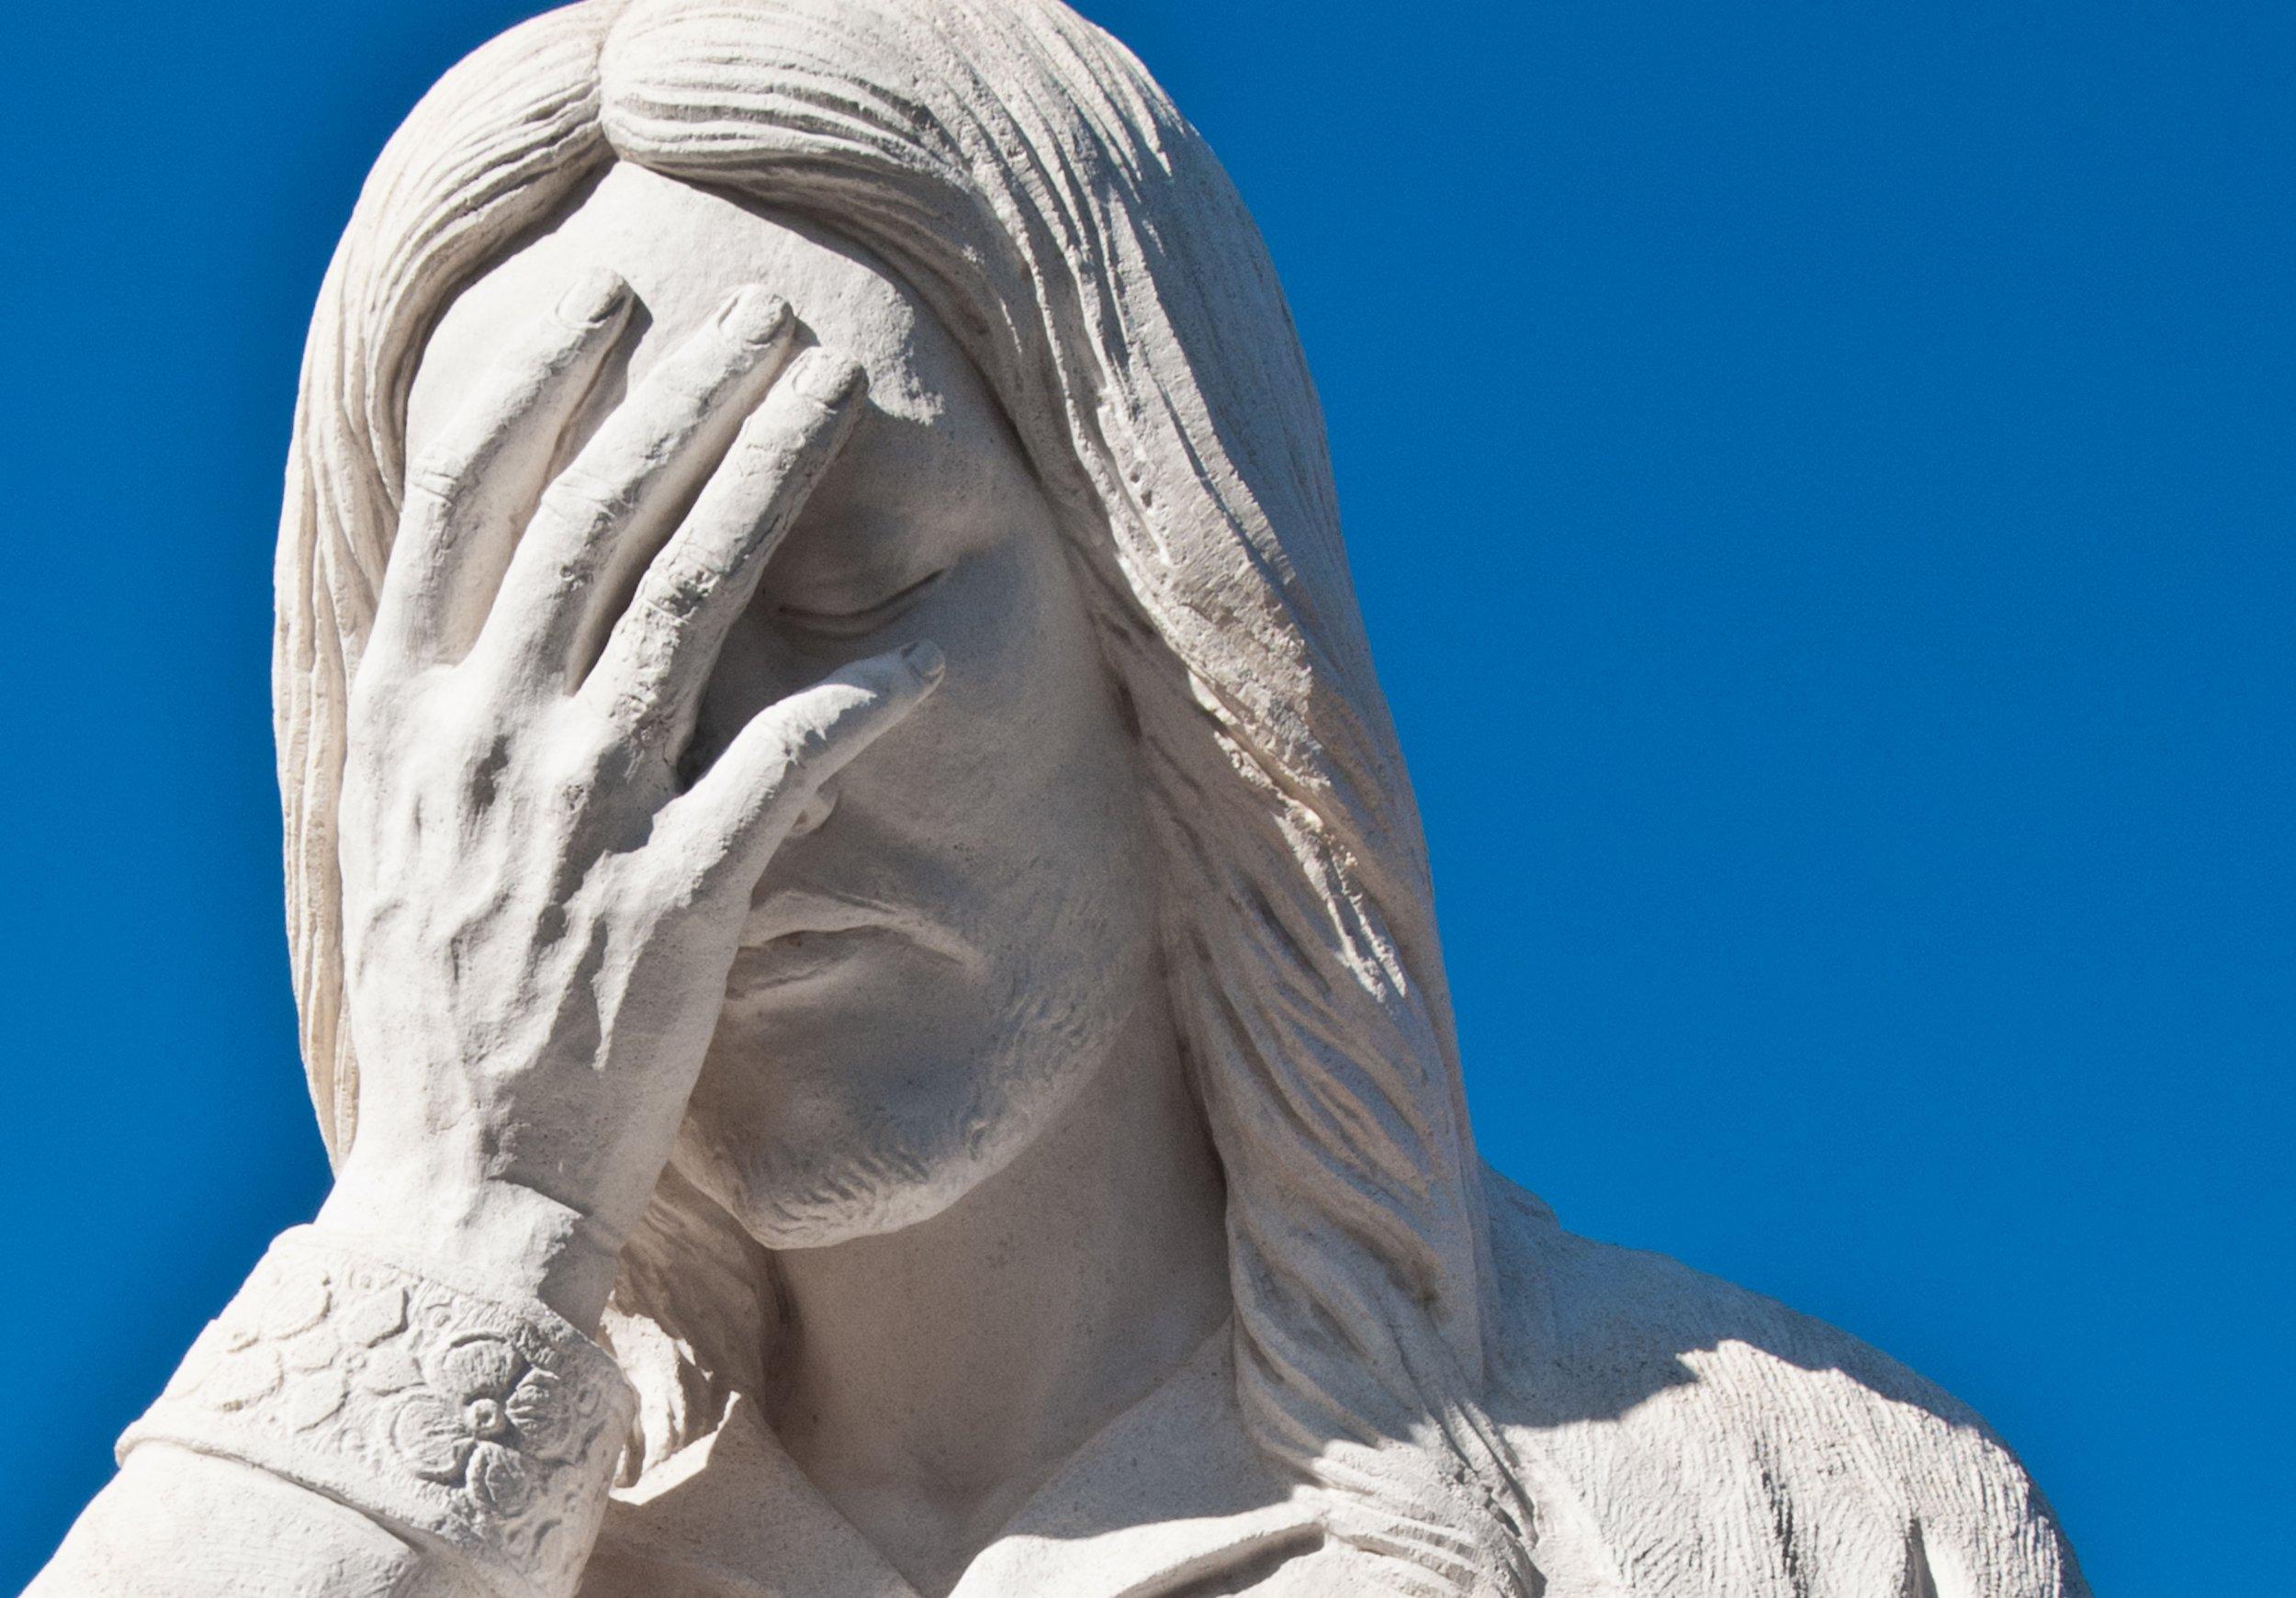 Catholic Guilt The Lying Scheming Altar Boy Behind A